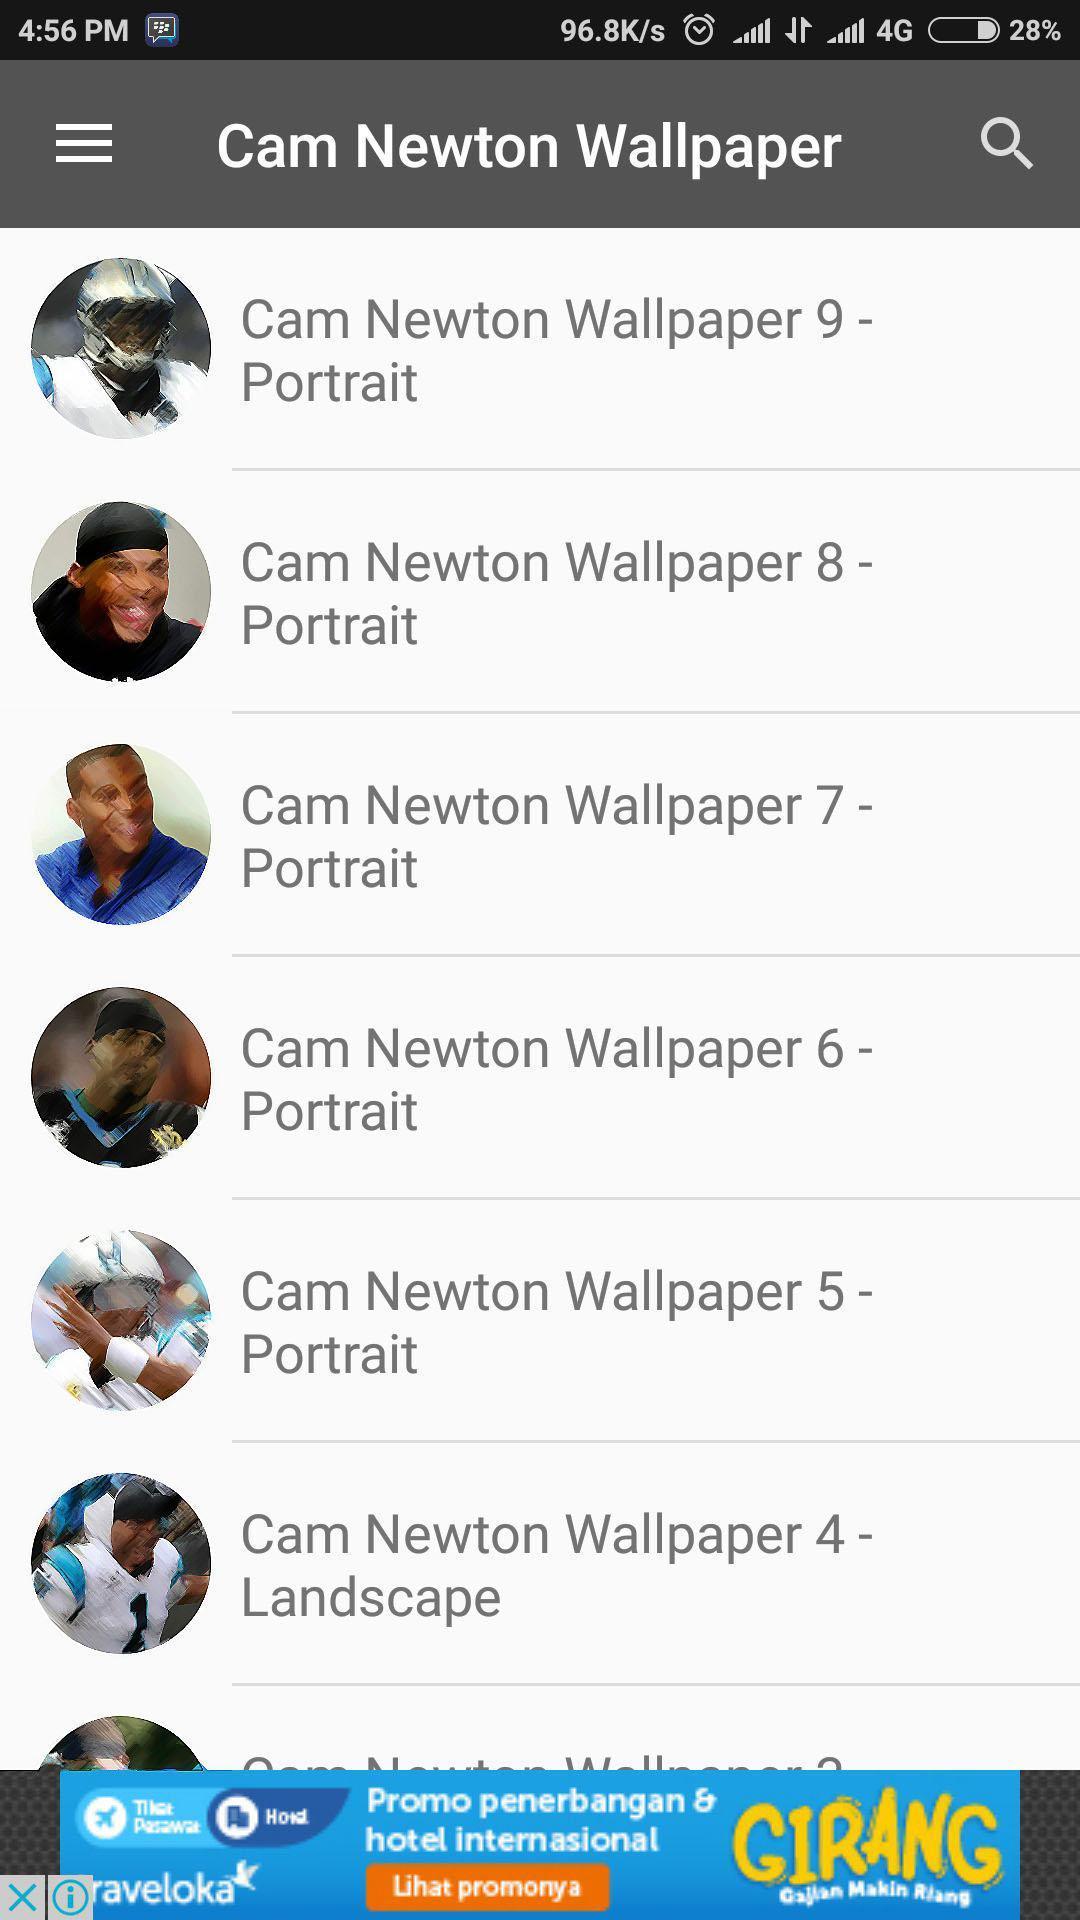 Cam Newton Wallpaper poster